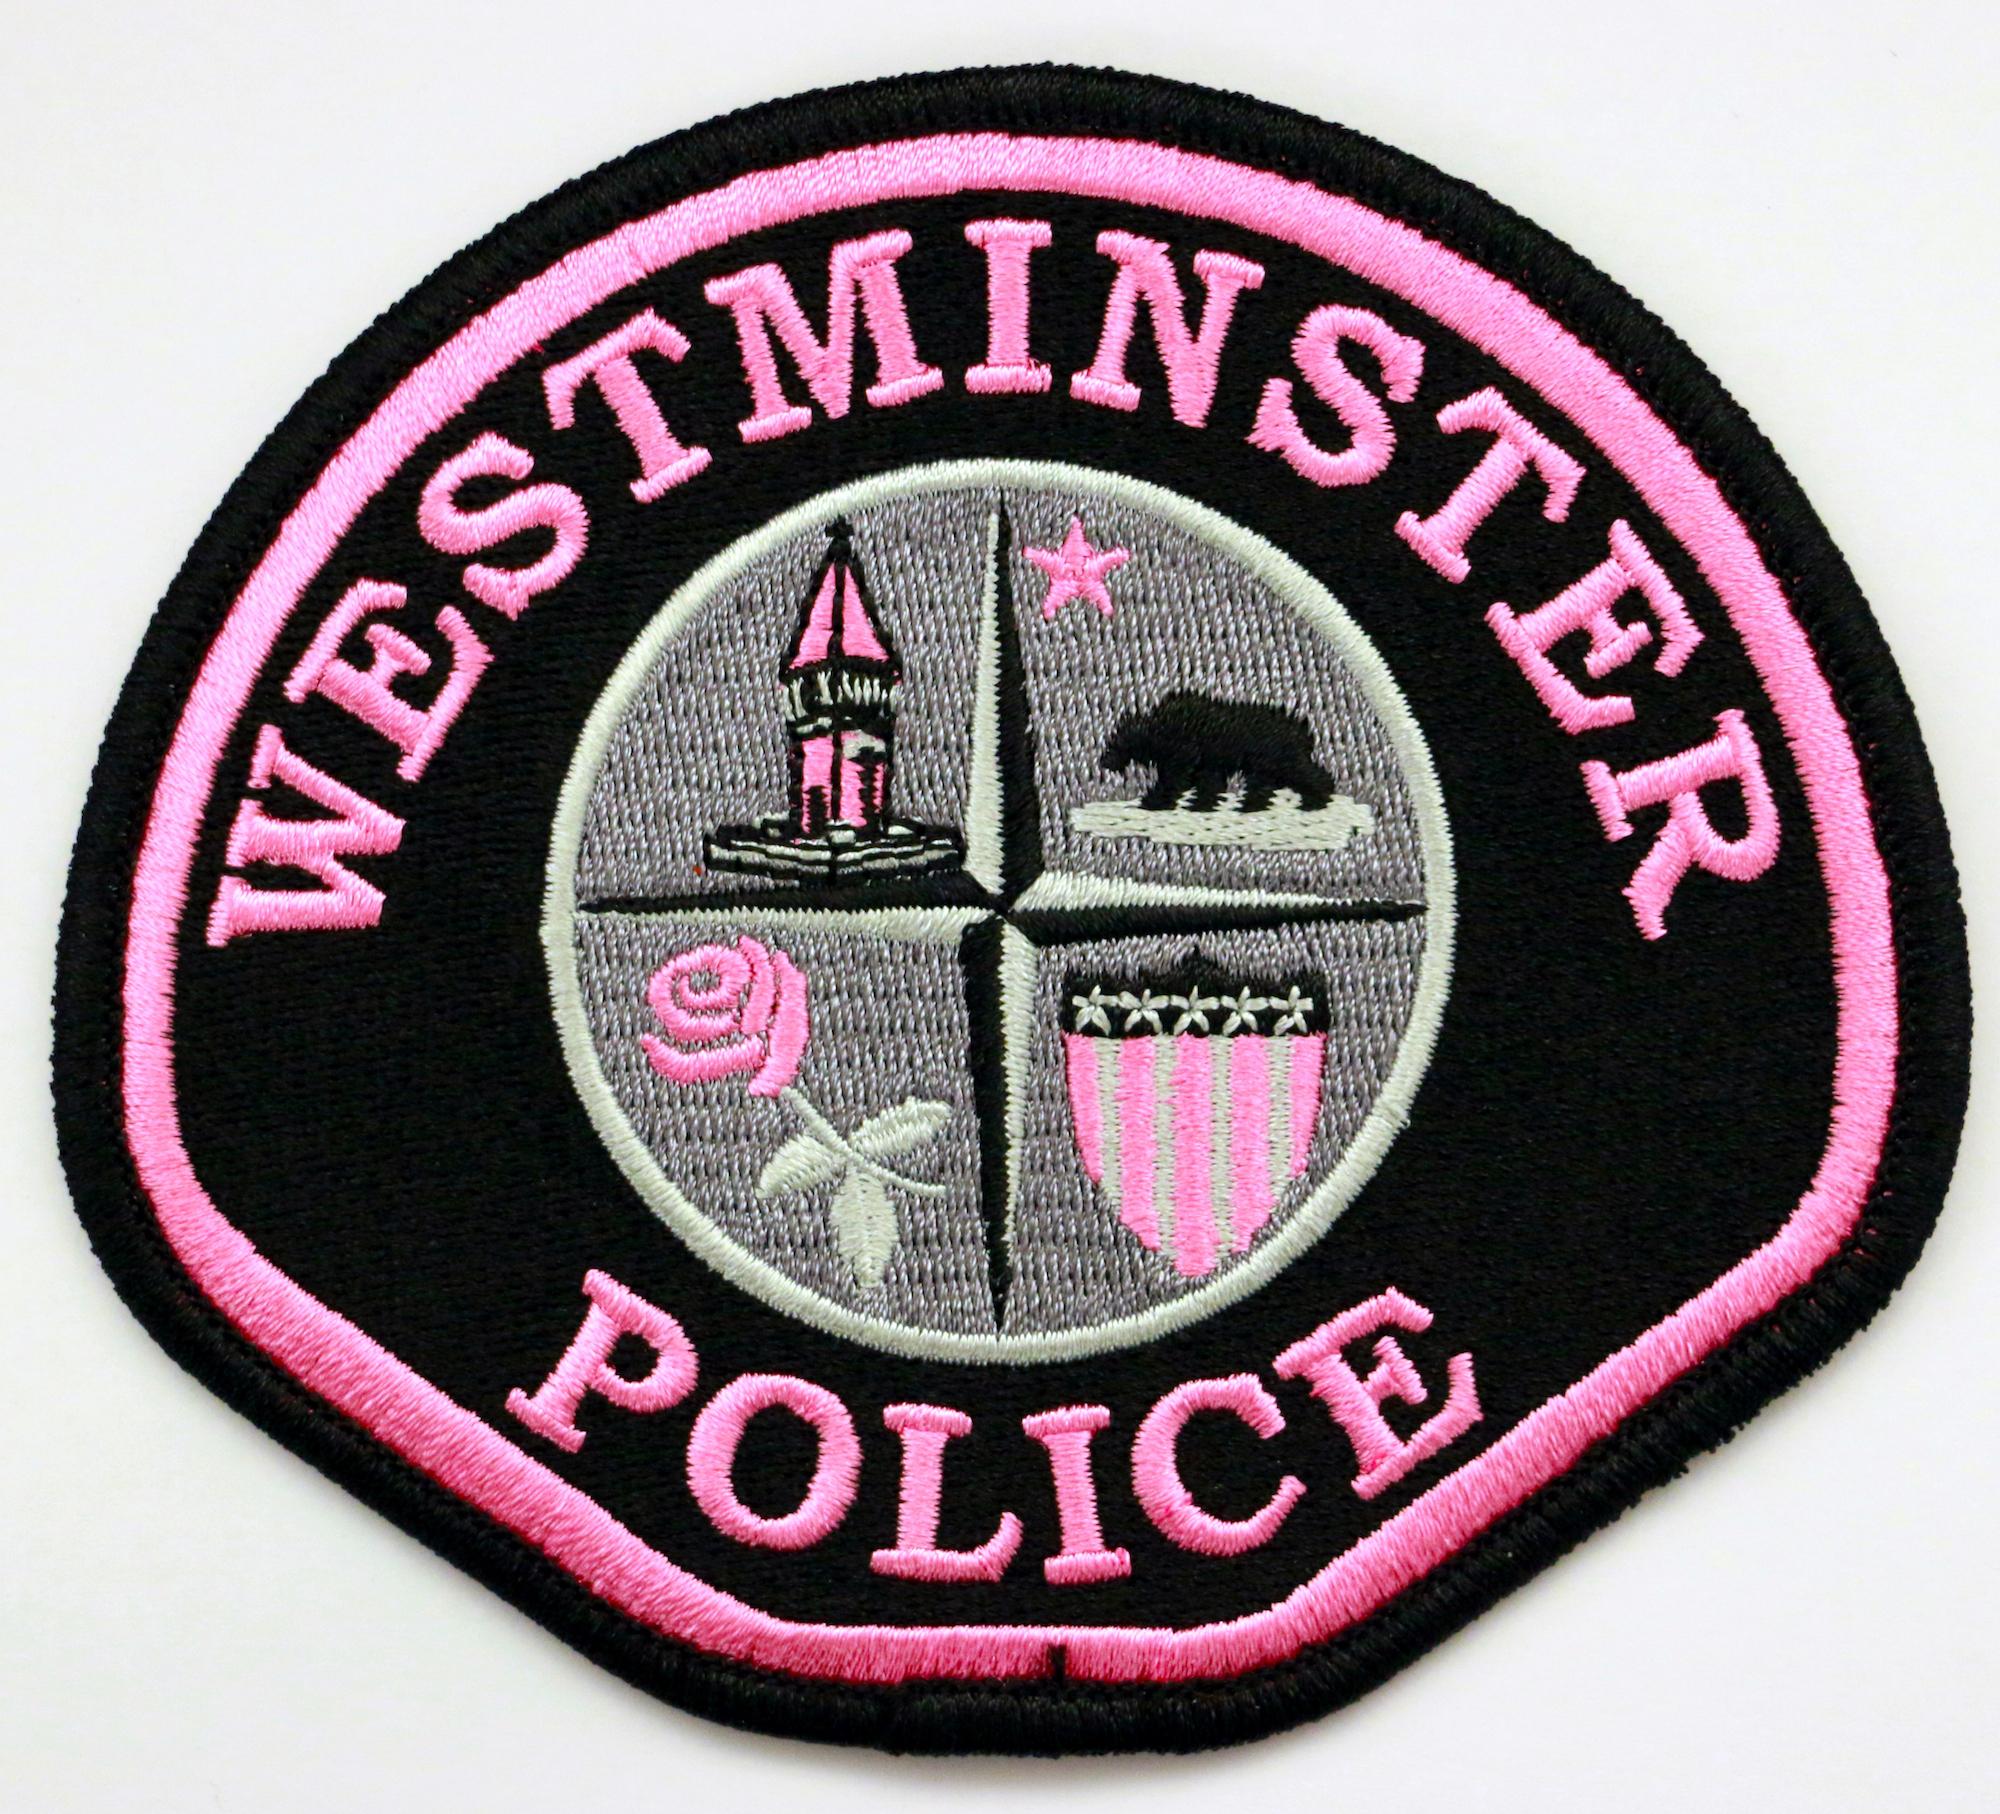 WPD Pink Patch.jpg